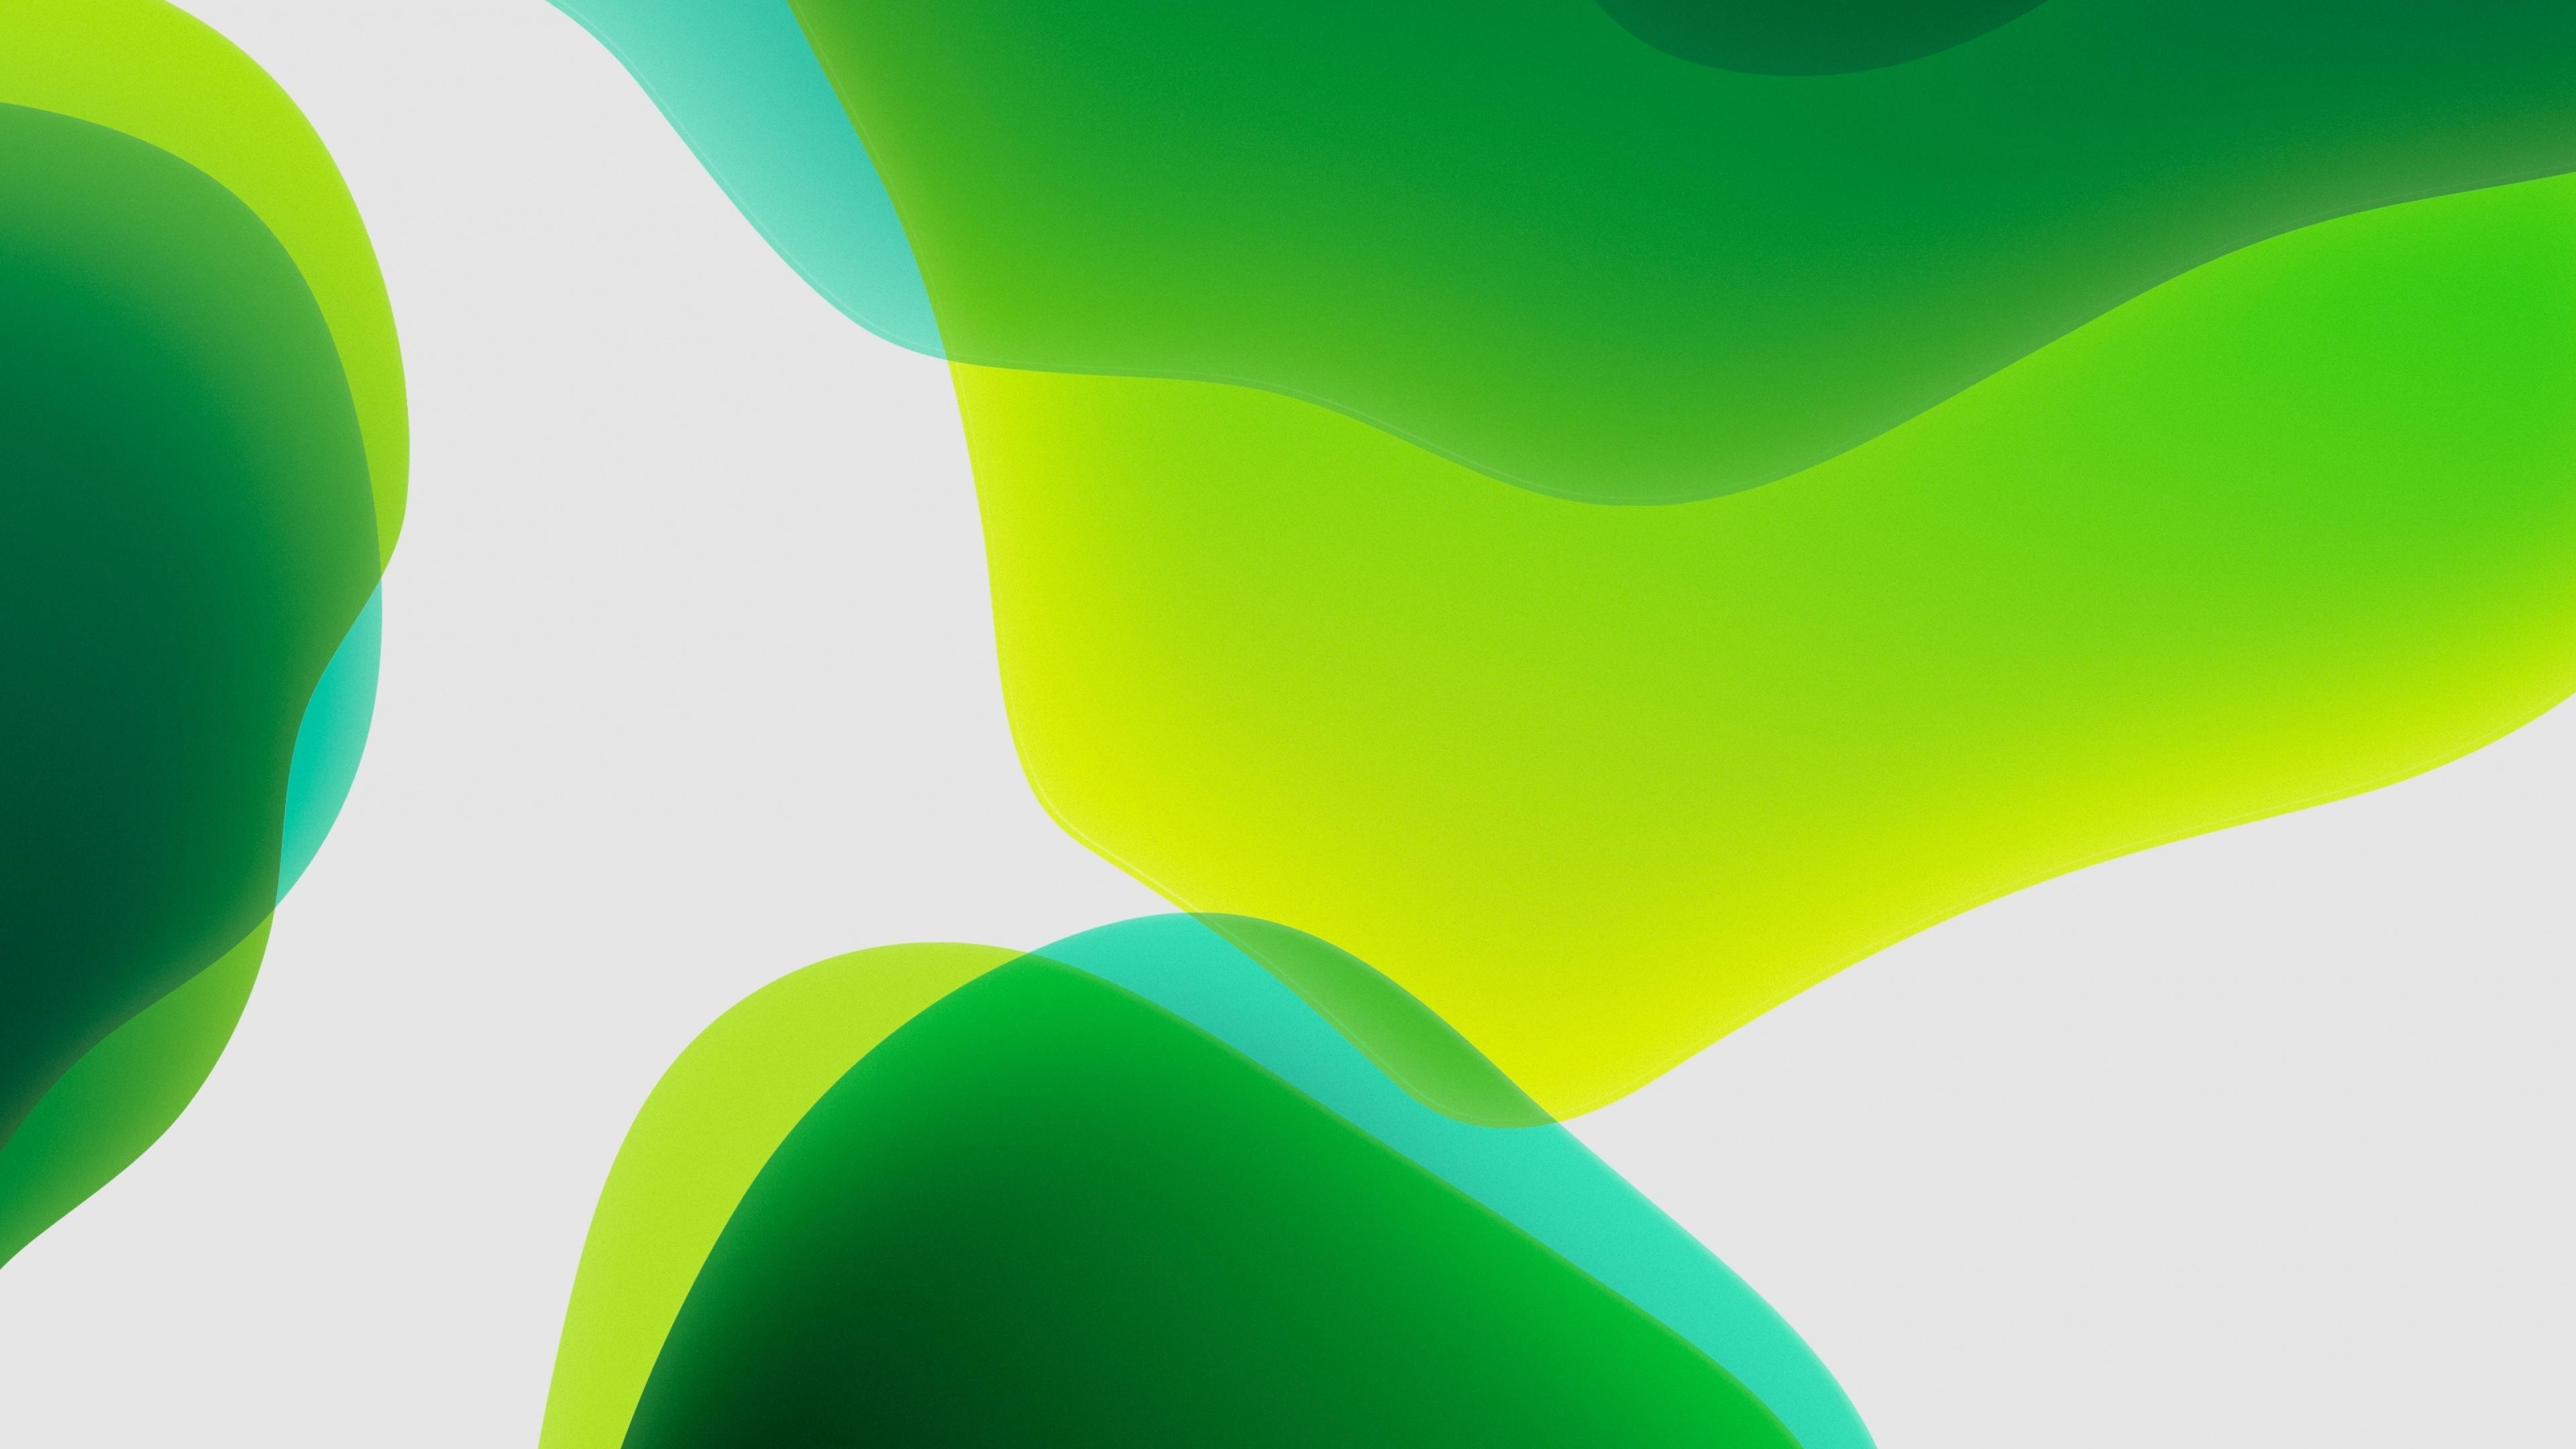 Ios 13 Liquid free wallpaper